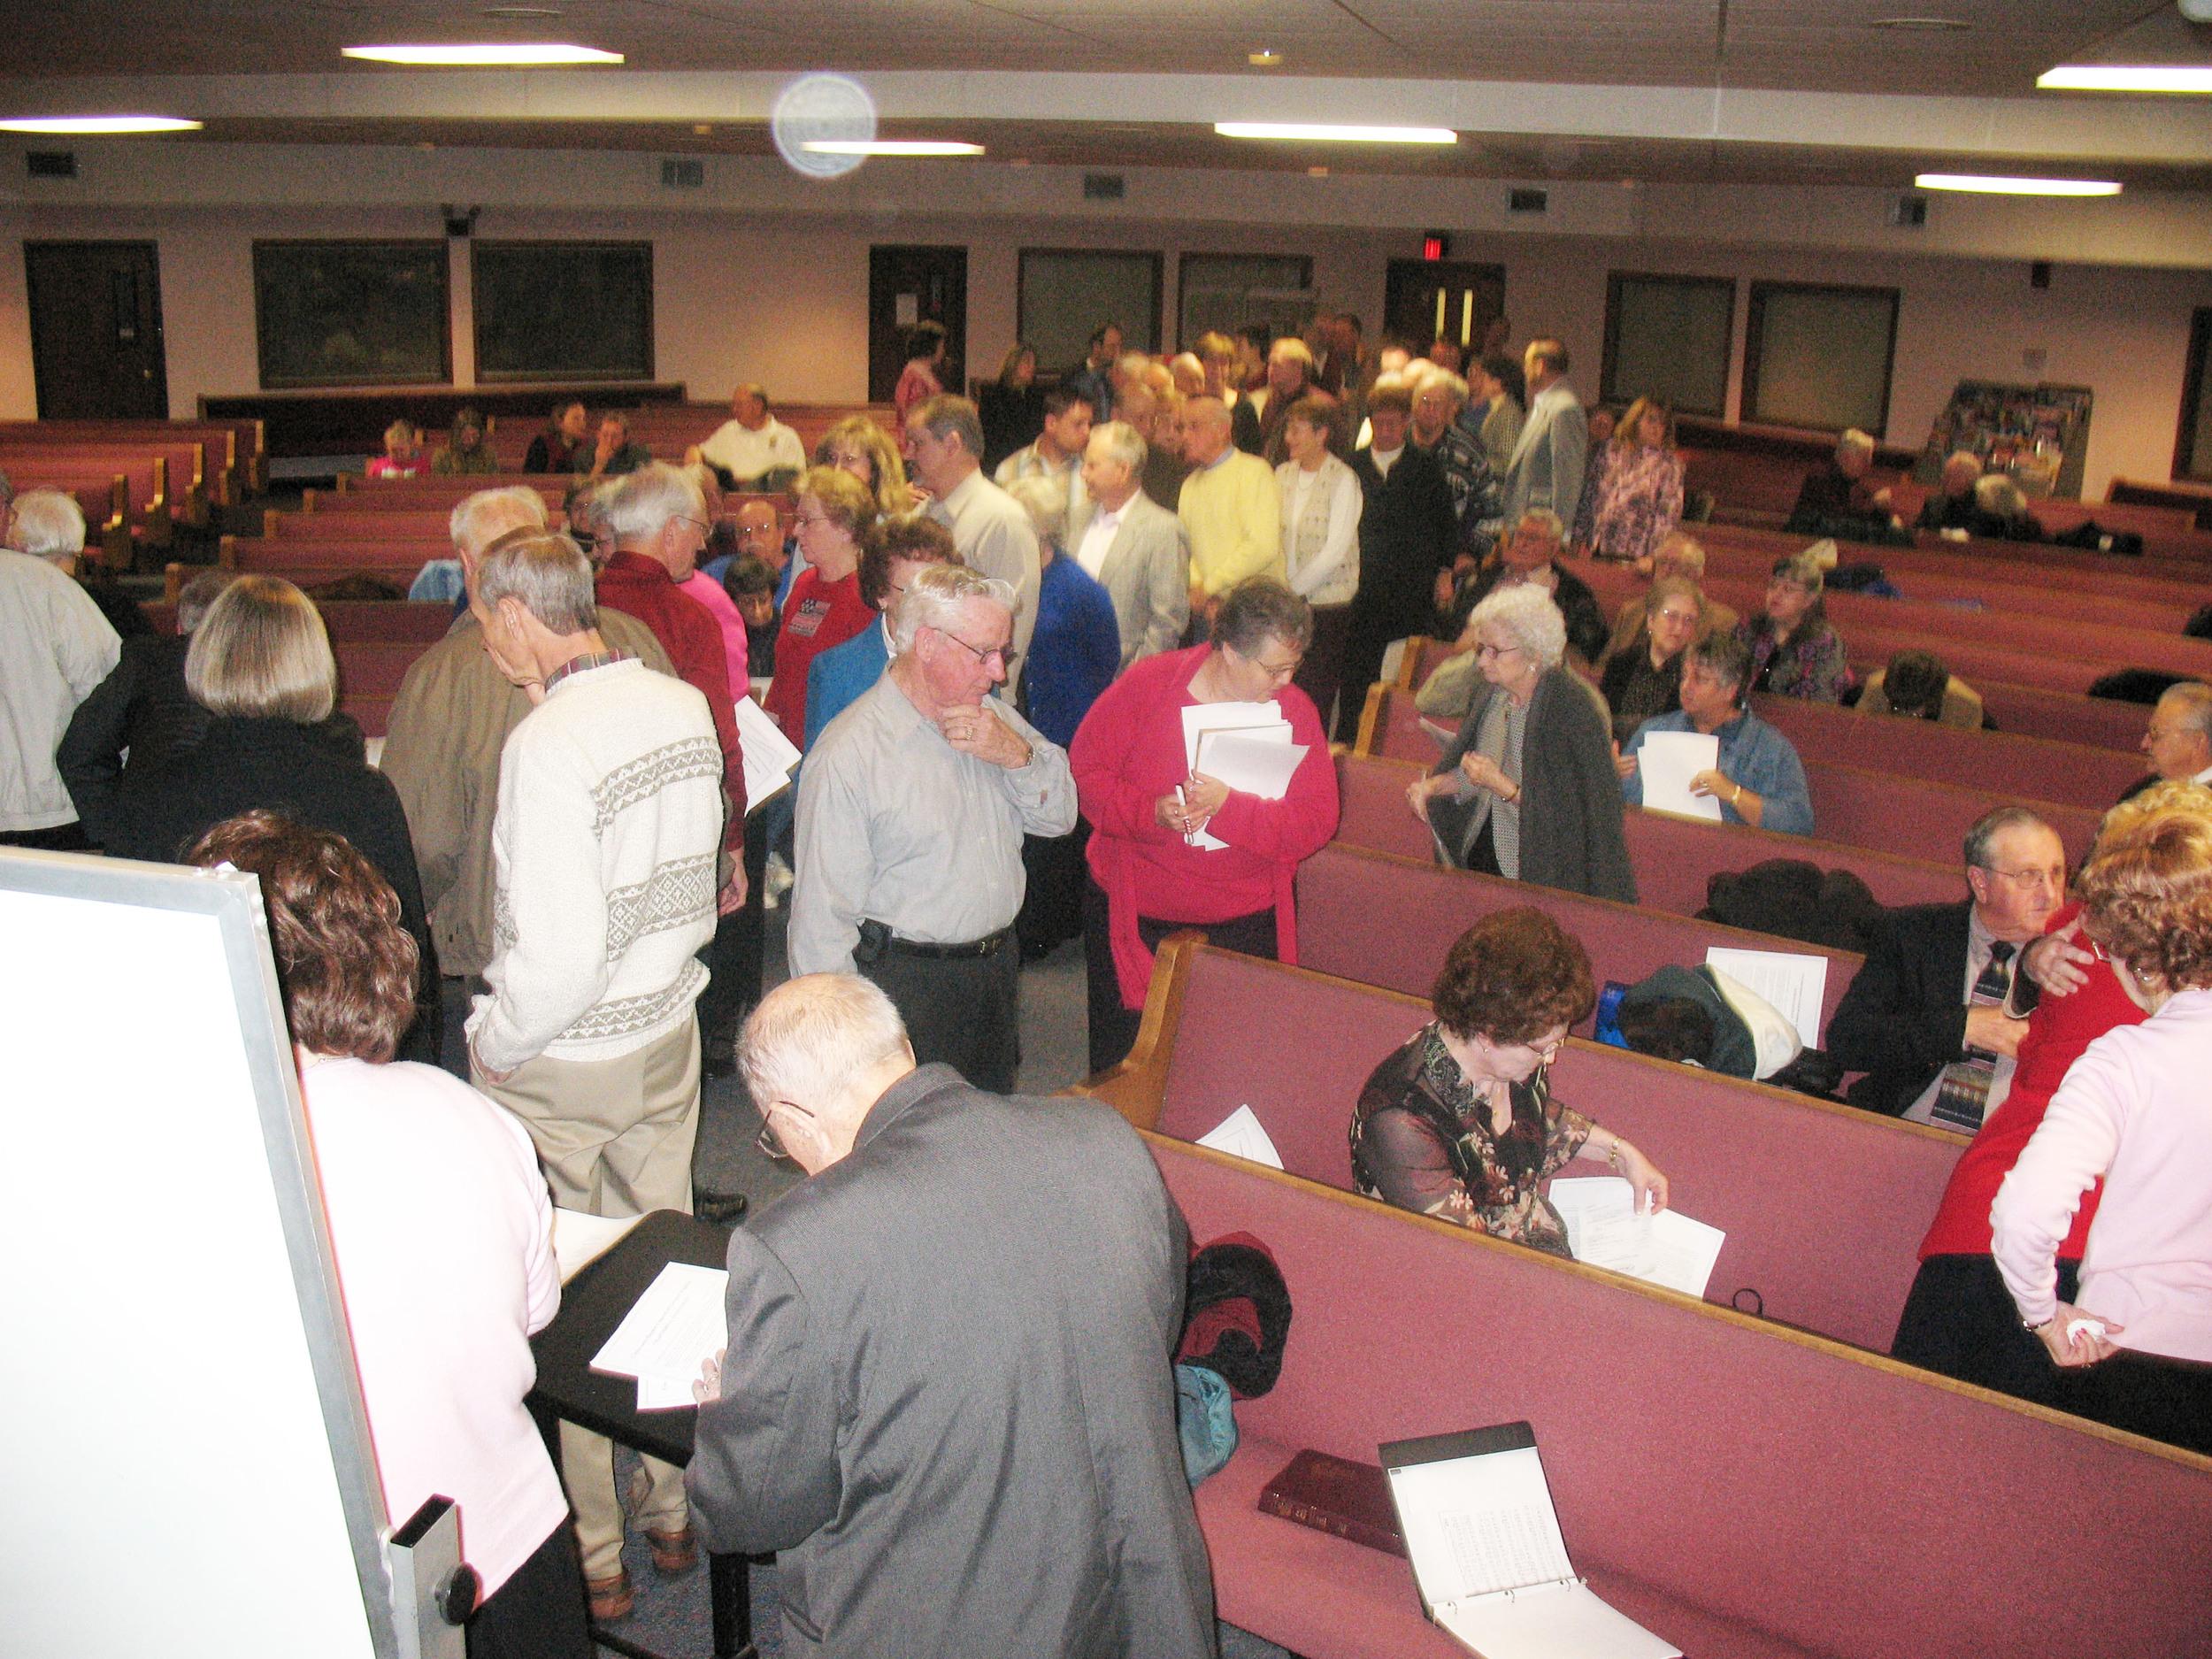 Organizational Meeting at Sunrise Christian Academy on February 11, 2007. 130 Charter Members.